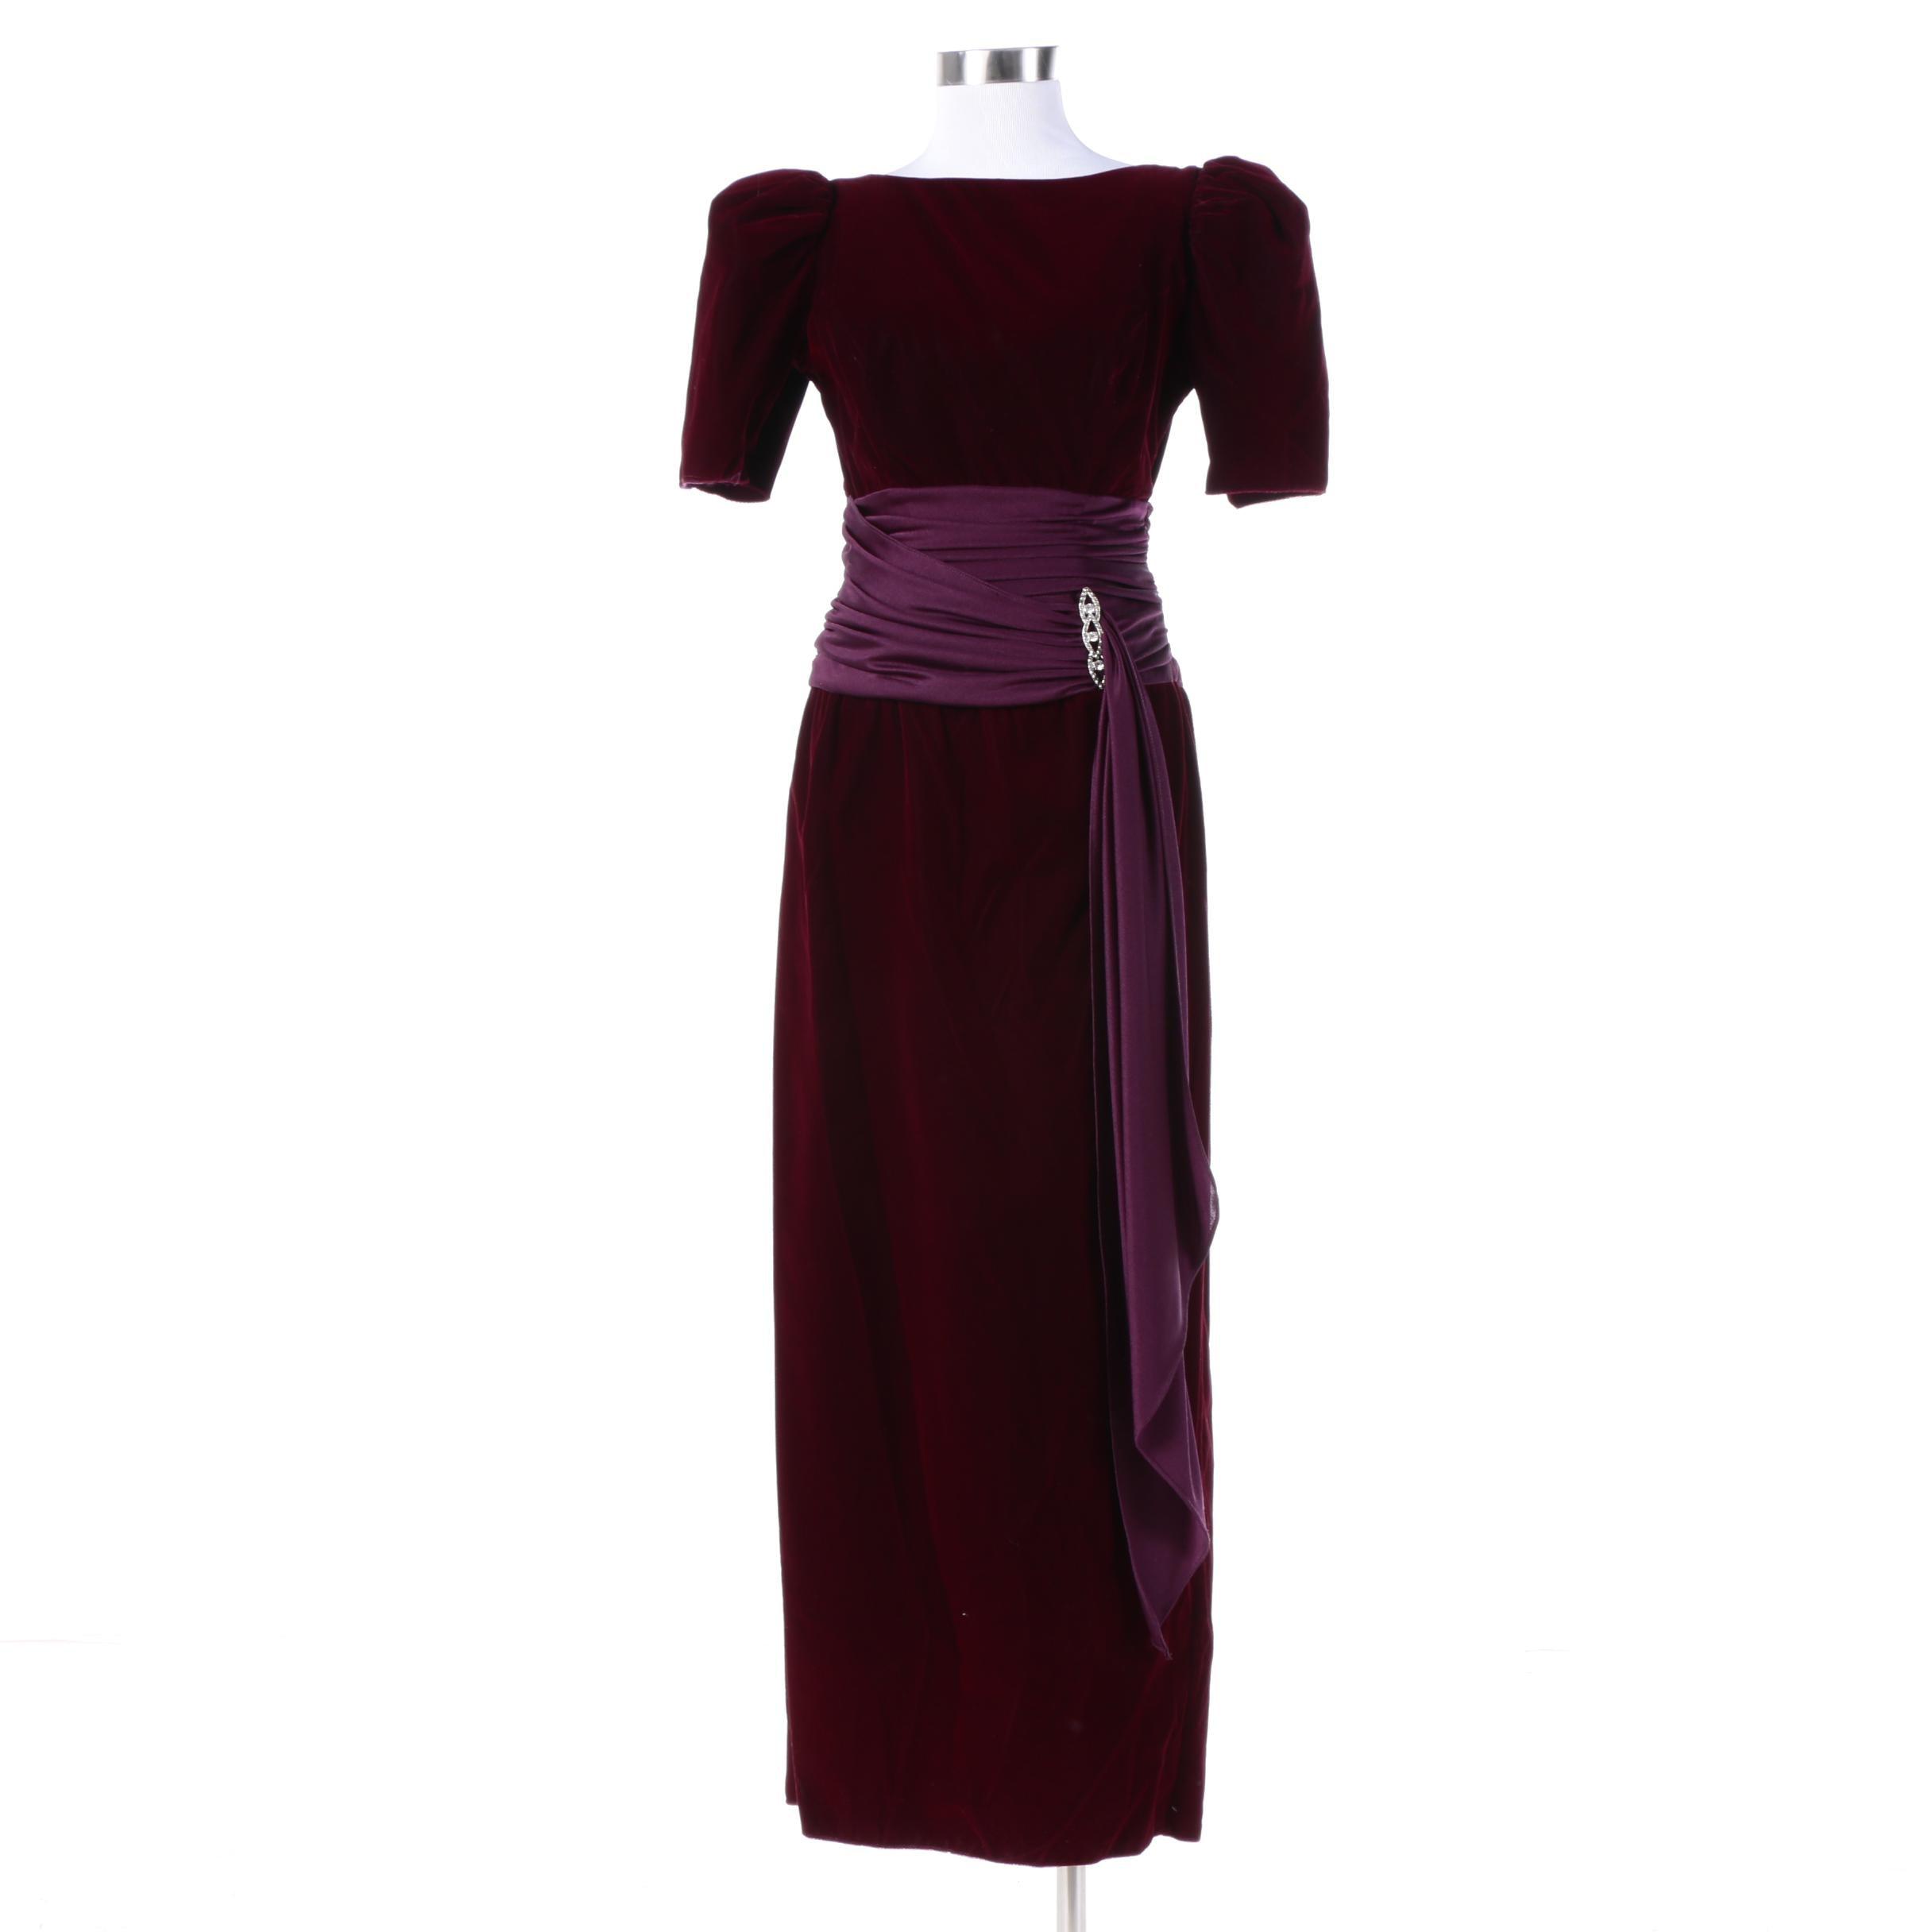 Vintage Alfred Angelo Burgundy Velvet Gown